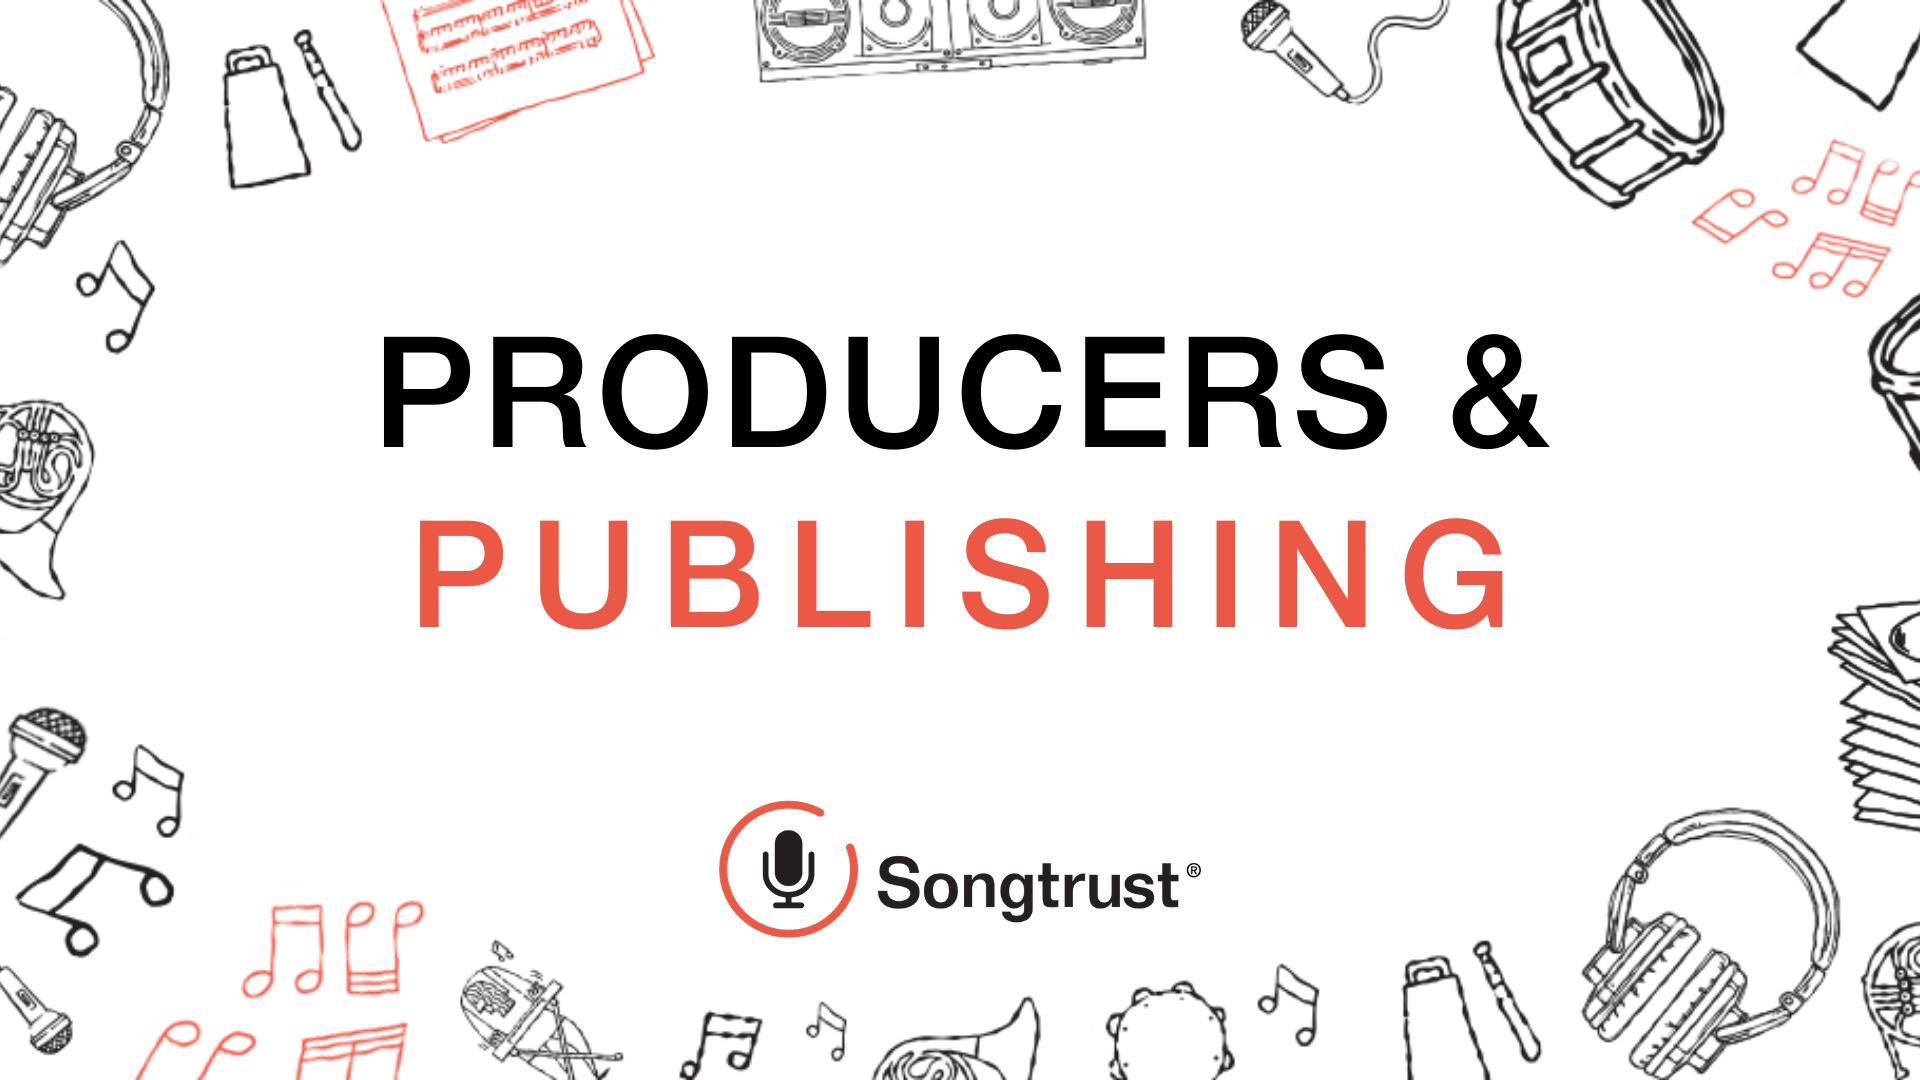 WB13 - Producers & Publishing Video (1) (1)